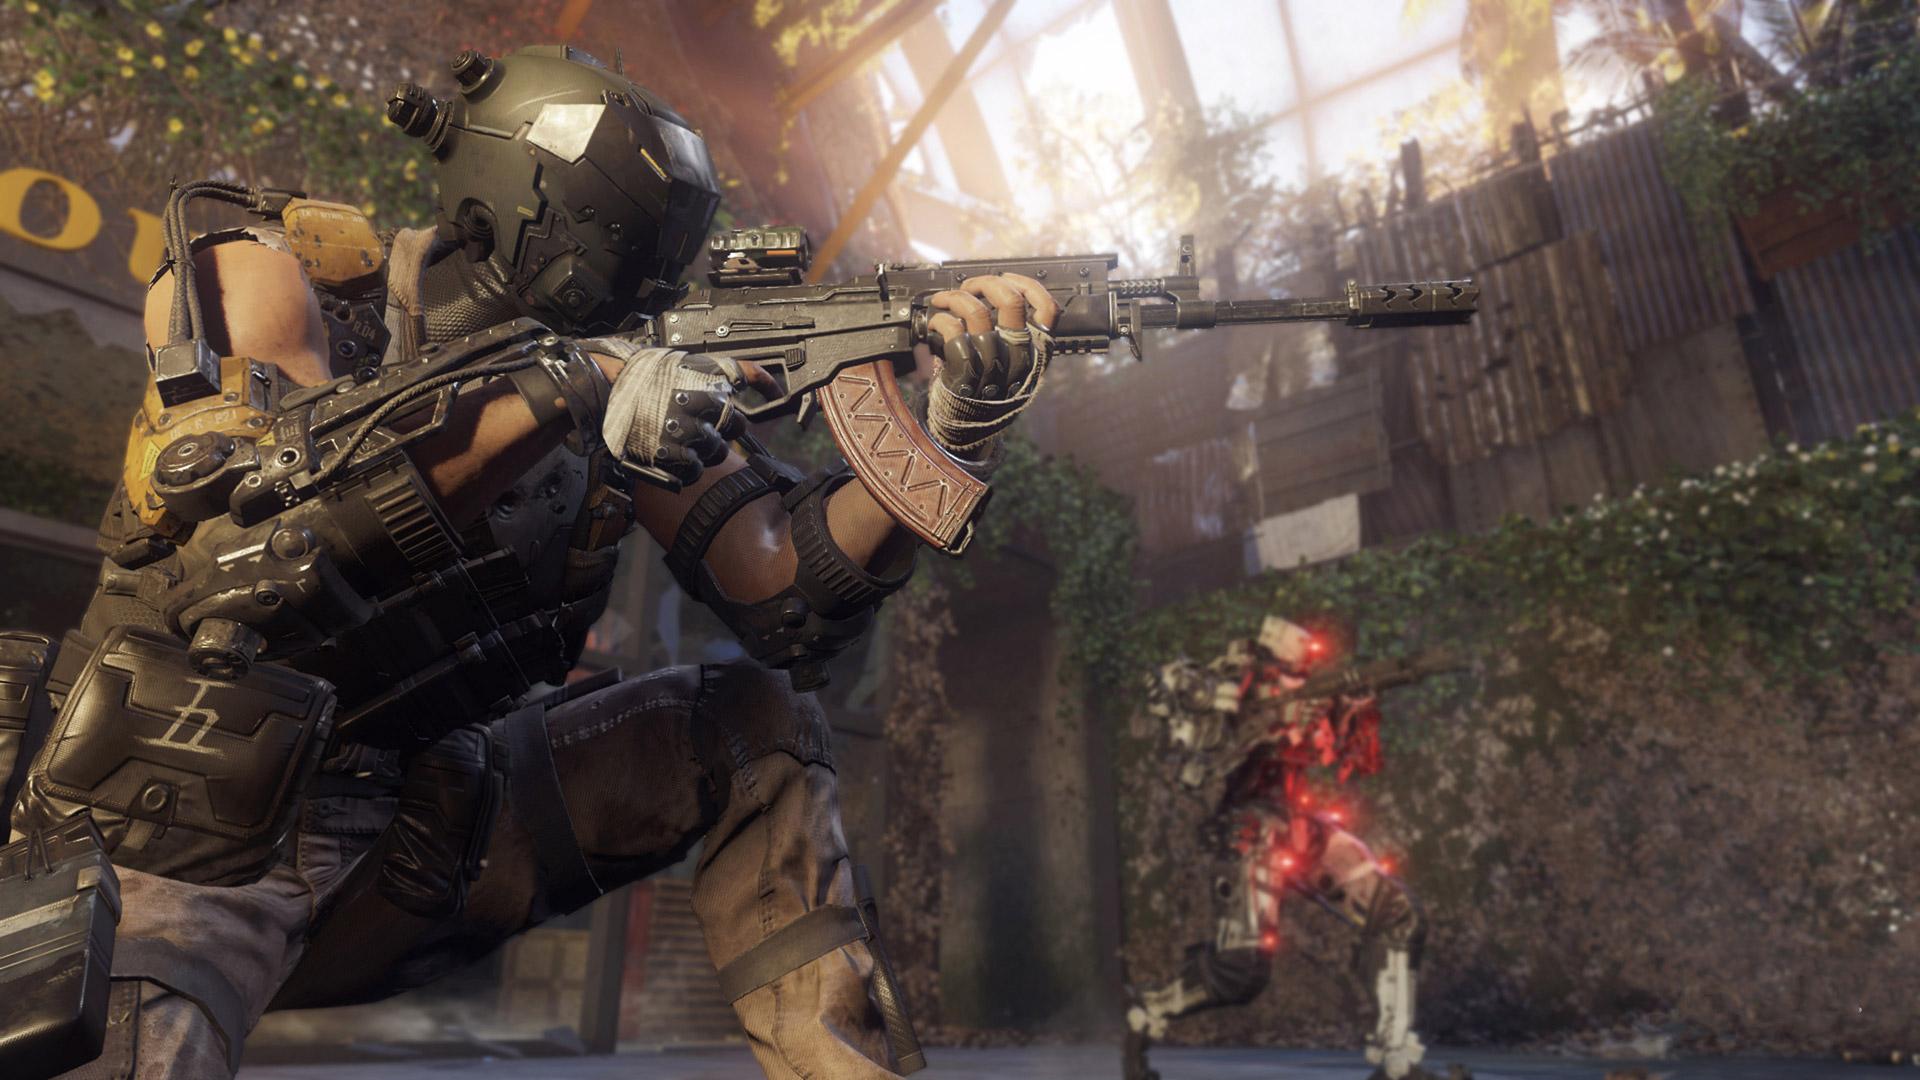 Call of Duty: Black Ops III Wallpaper in 1920x1080